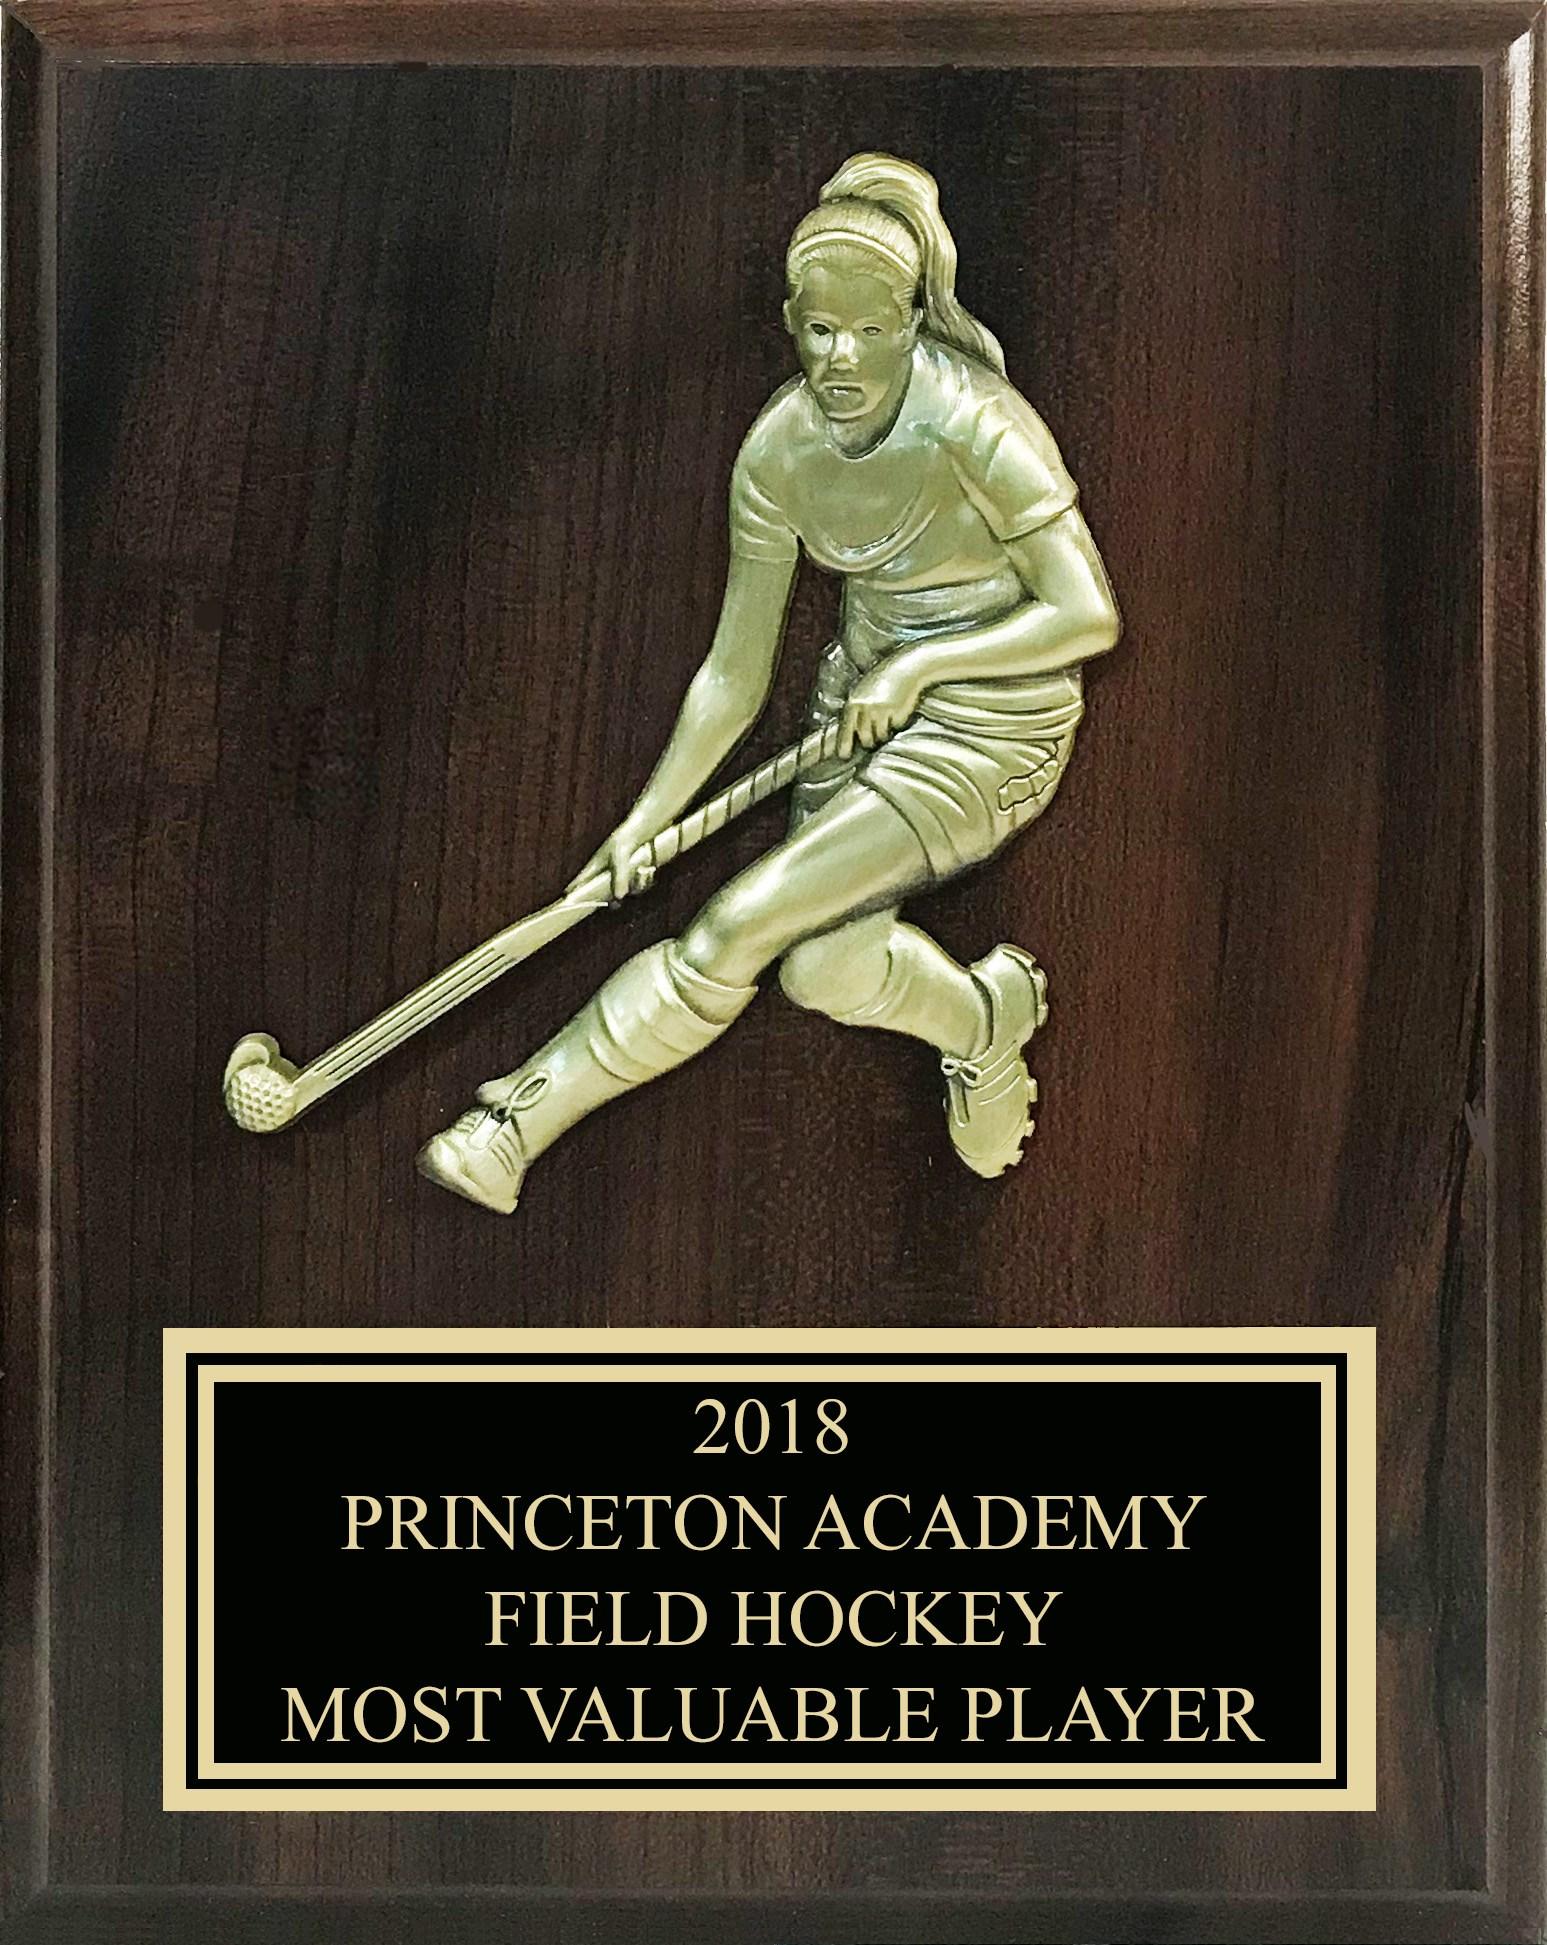 FHBV810 Cherry Field Hockey Plaque